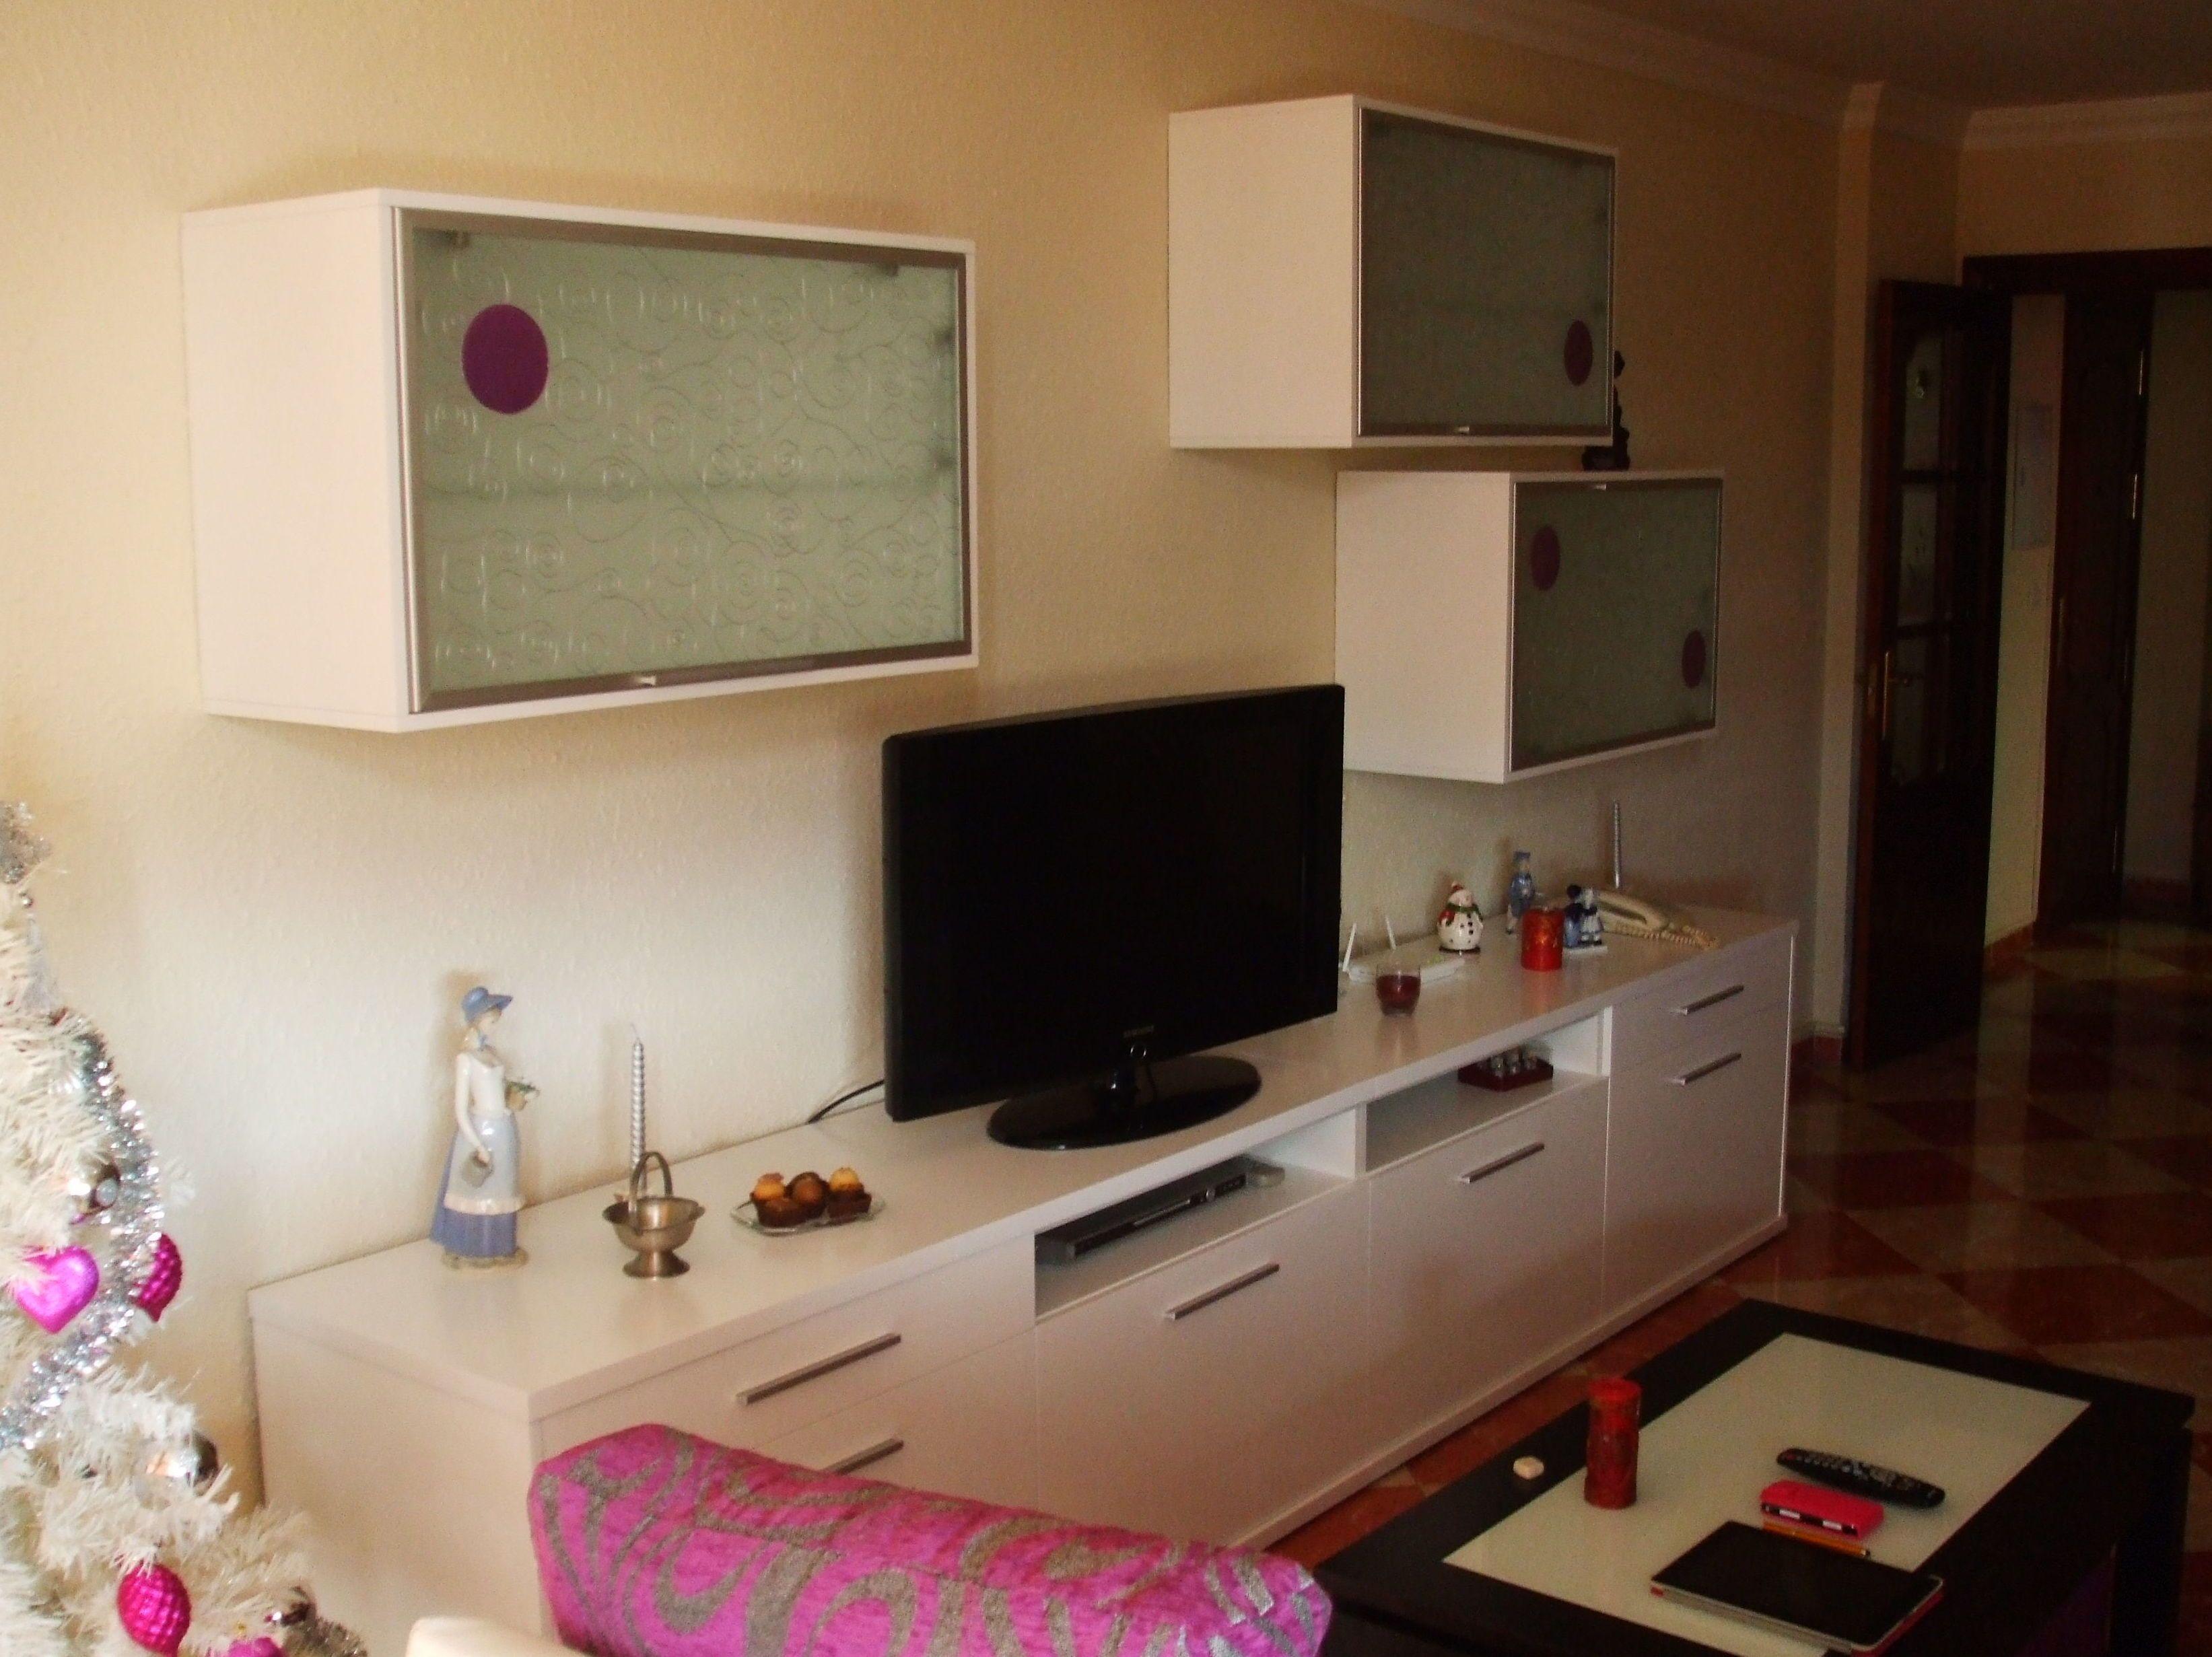 Muebles Diseo Baratos Elegant Pics With Muebles Diseo Baratos  # Muebles Sobre Diseo